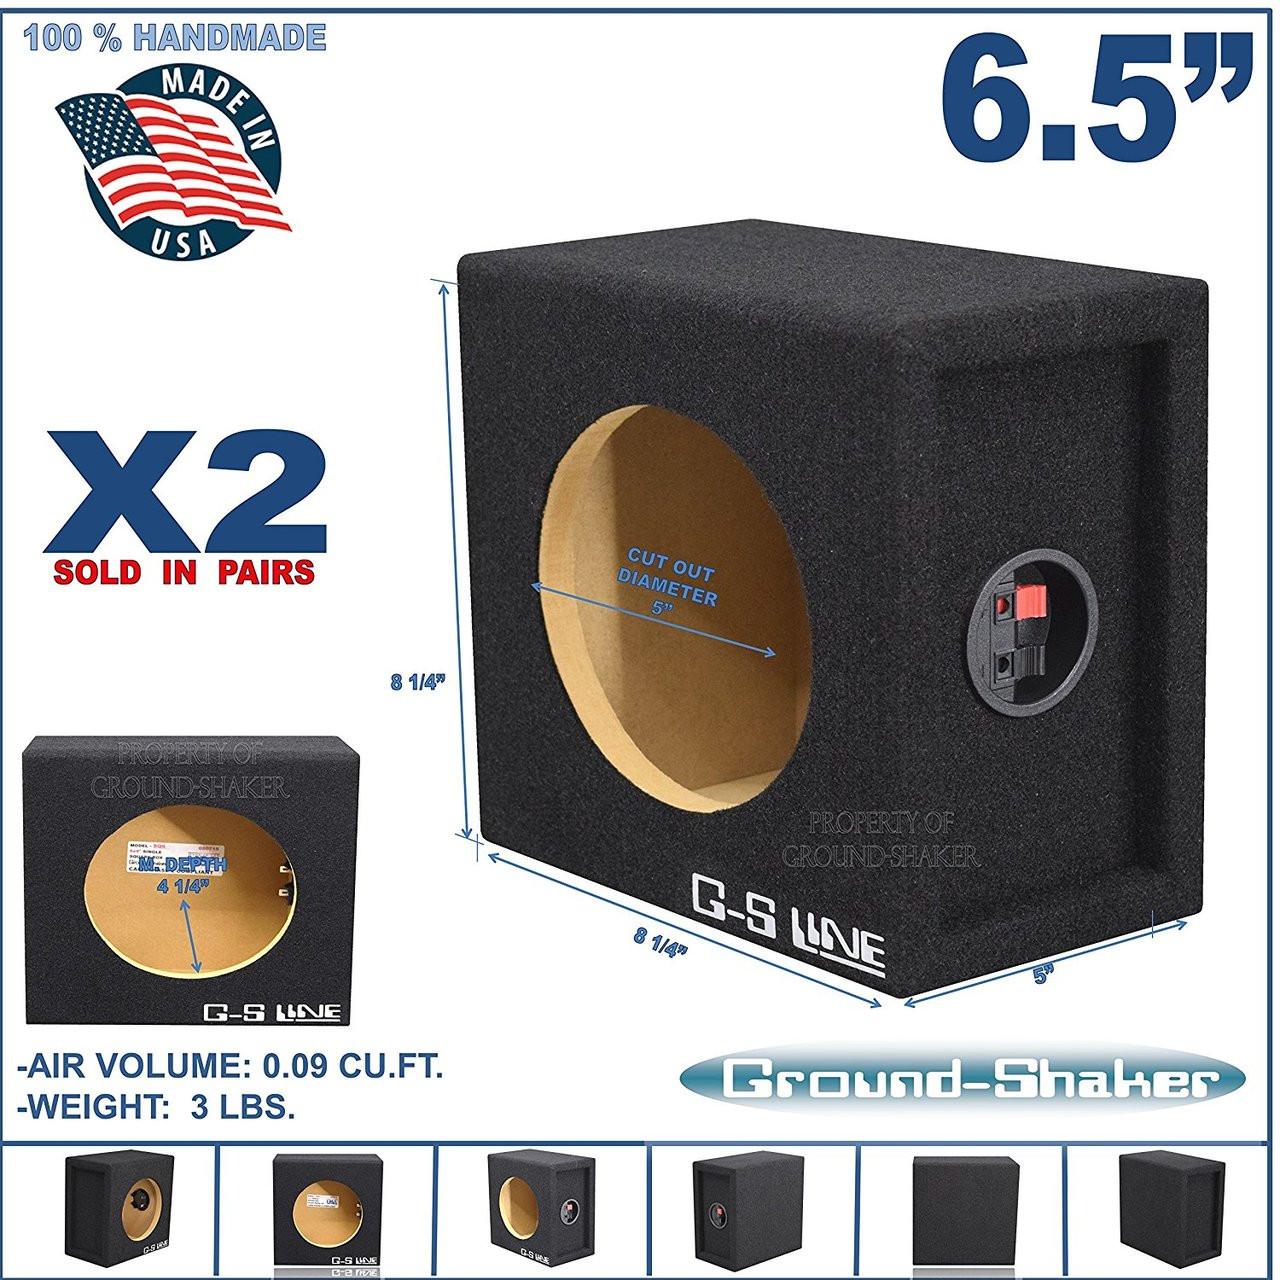 2x Ground Shaker SQ6.5 Single Square Subwoofer Enclosure Speaker Box - Black